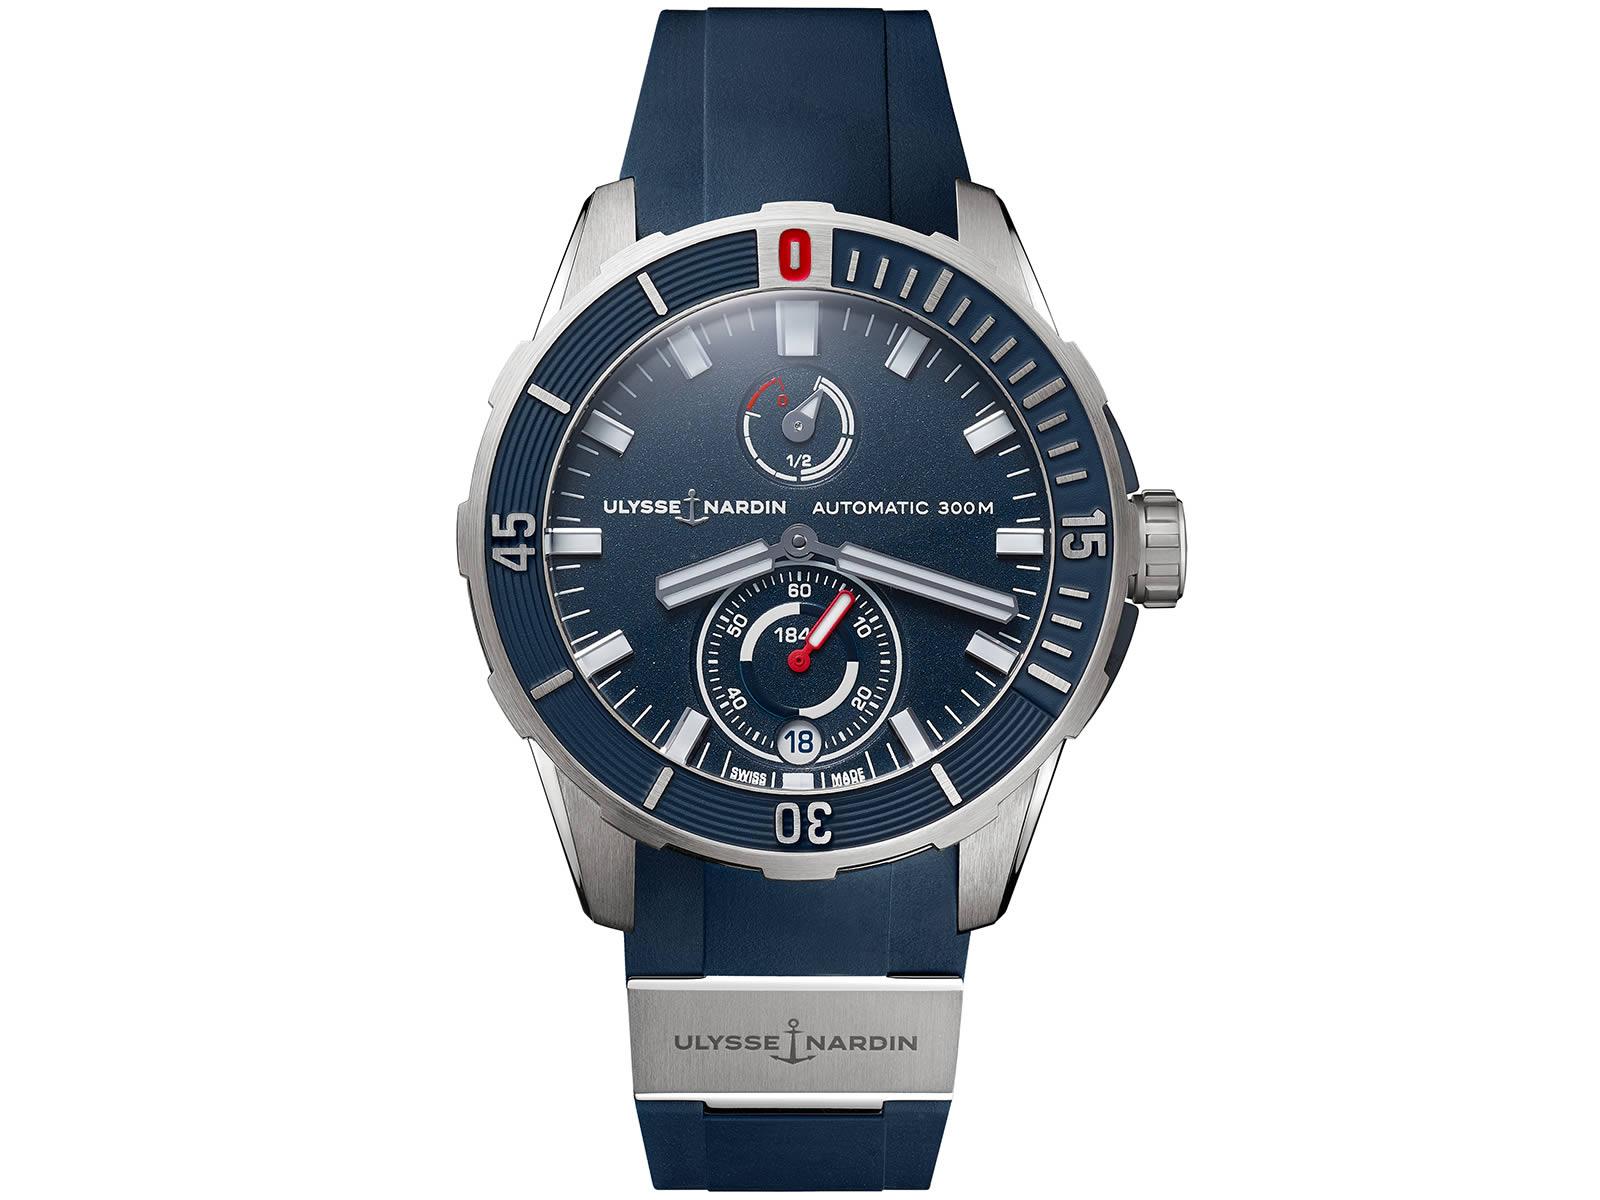 1183-170-3-93-ulysse-nardin-diver-chronometer-2018-models.jpg